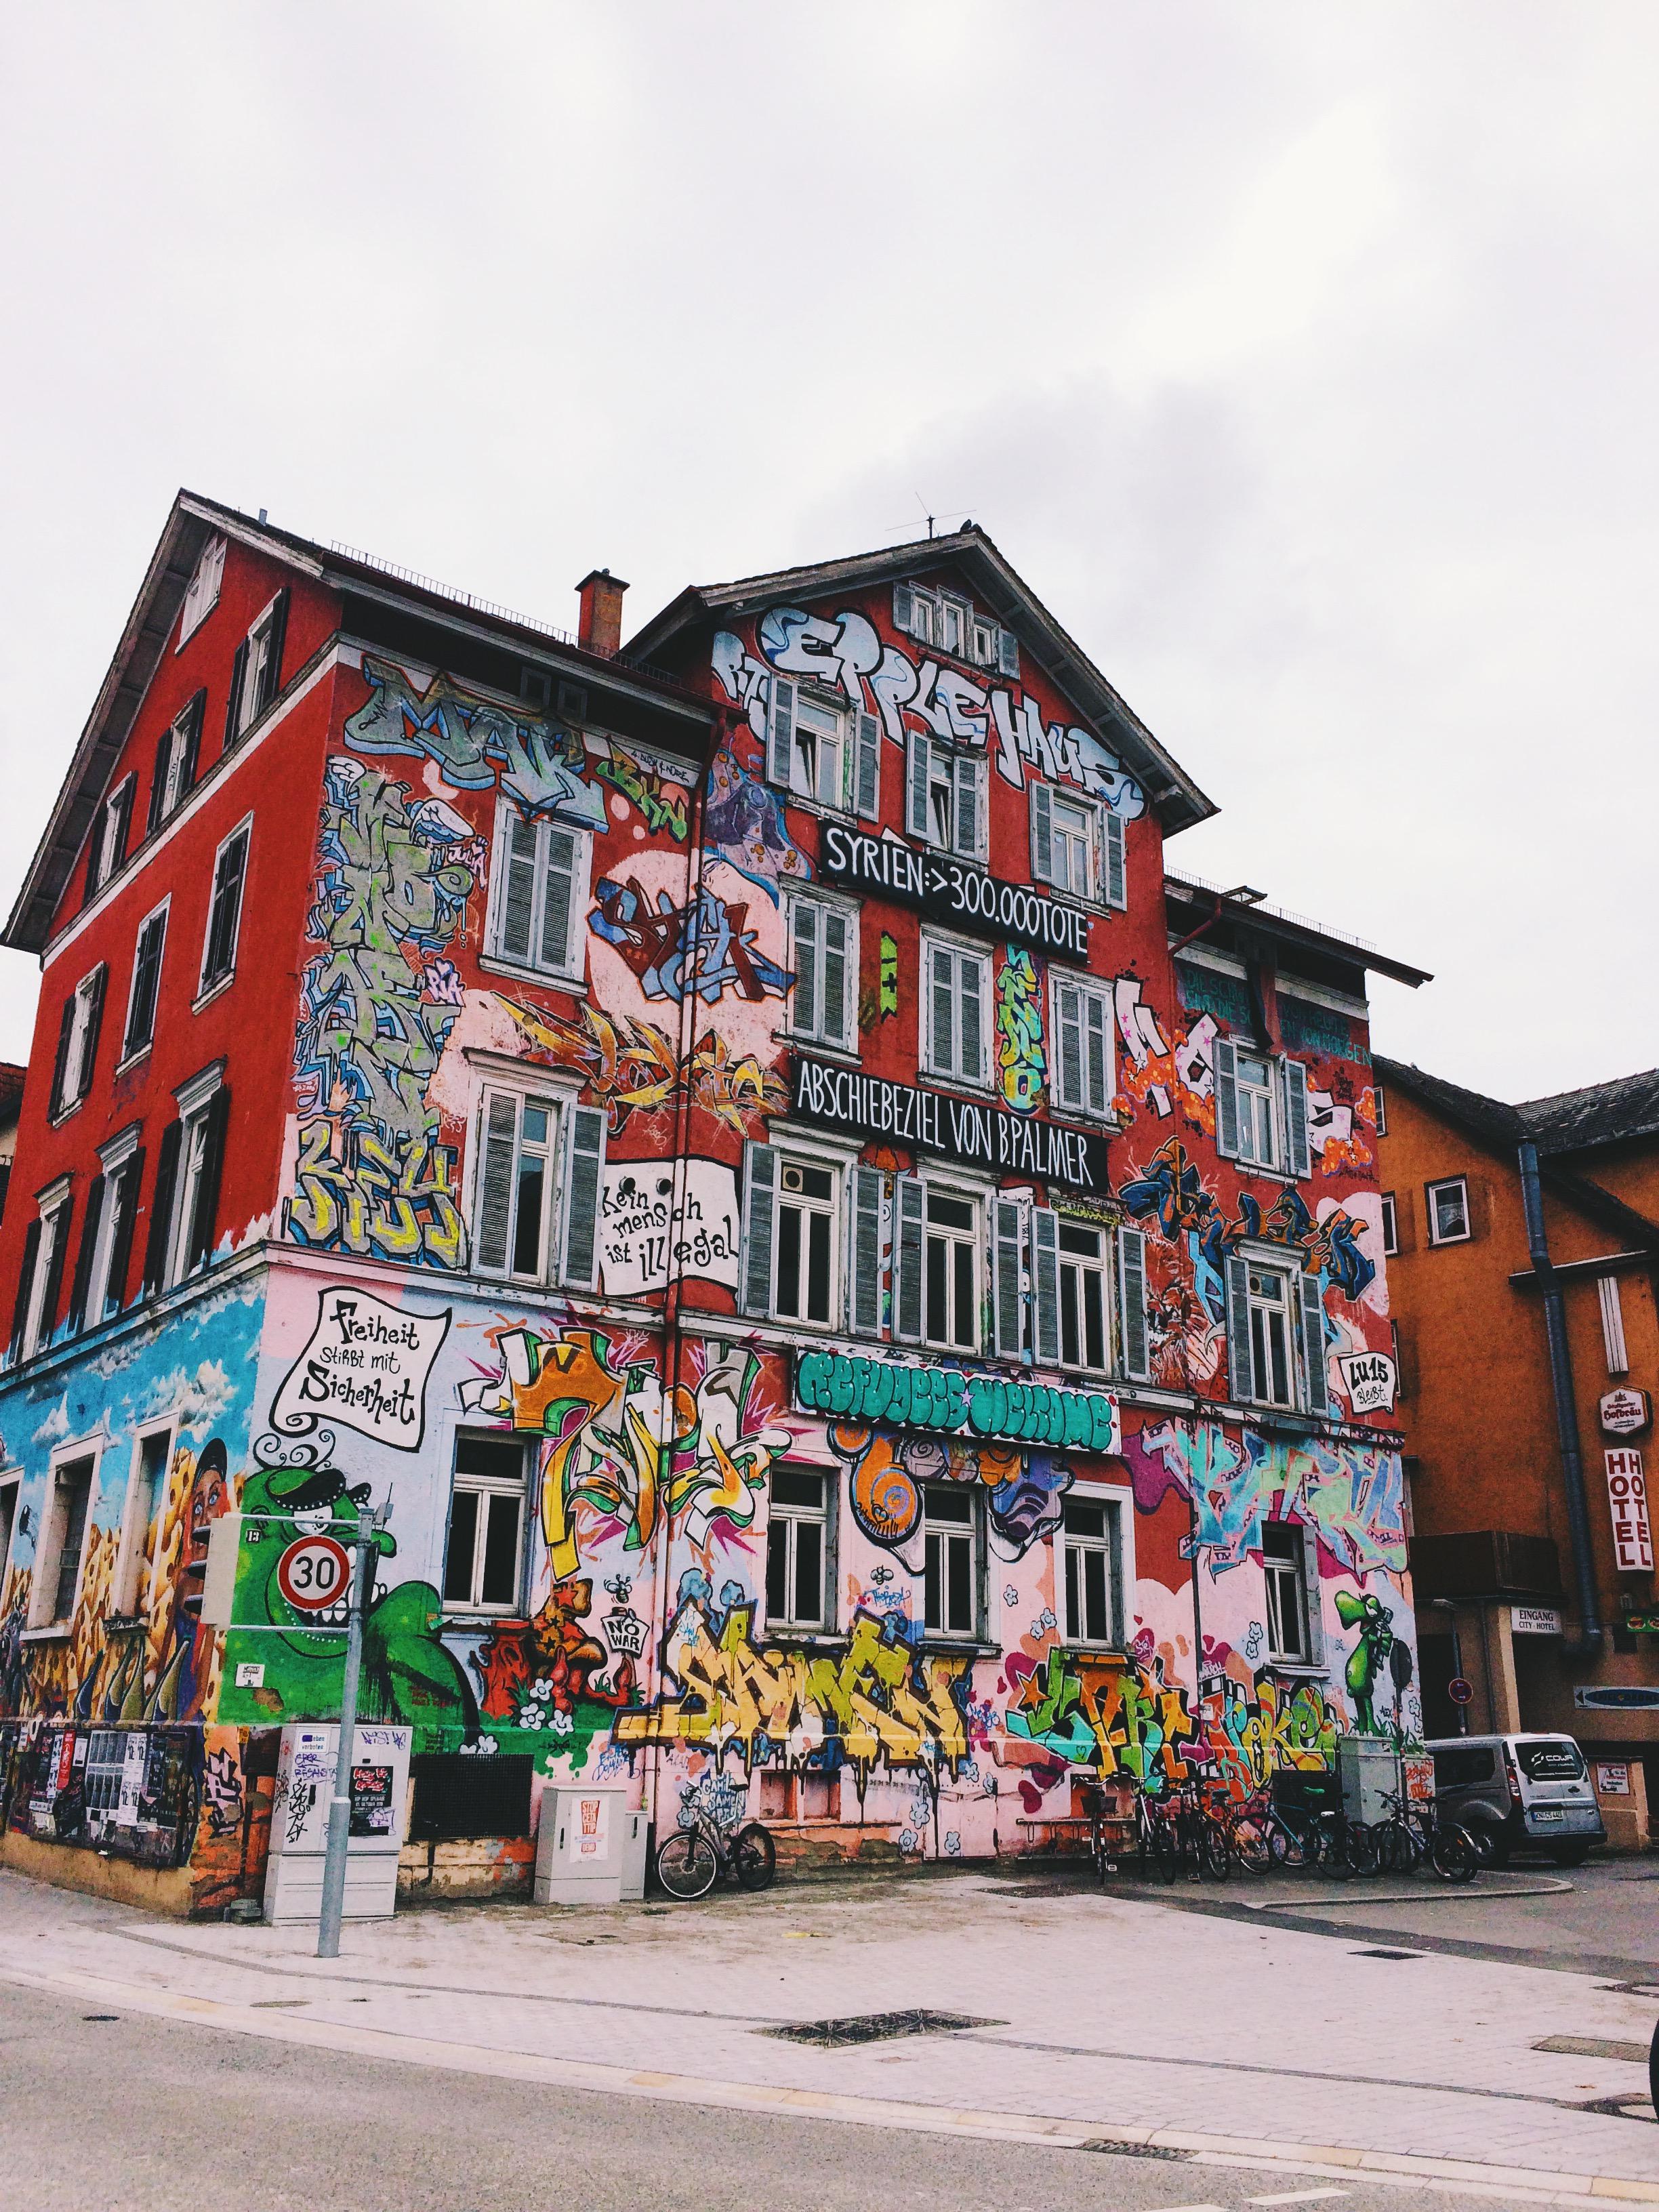 Tubingen, Refugees Welcome, Street Art, Germany, Graffiti